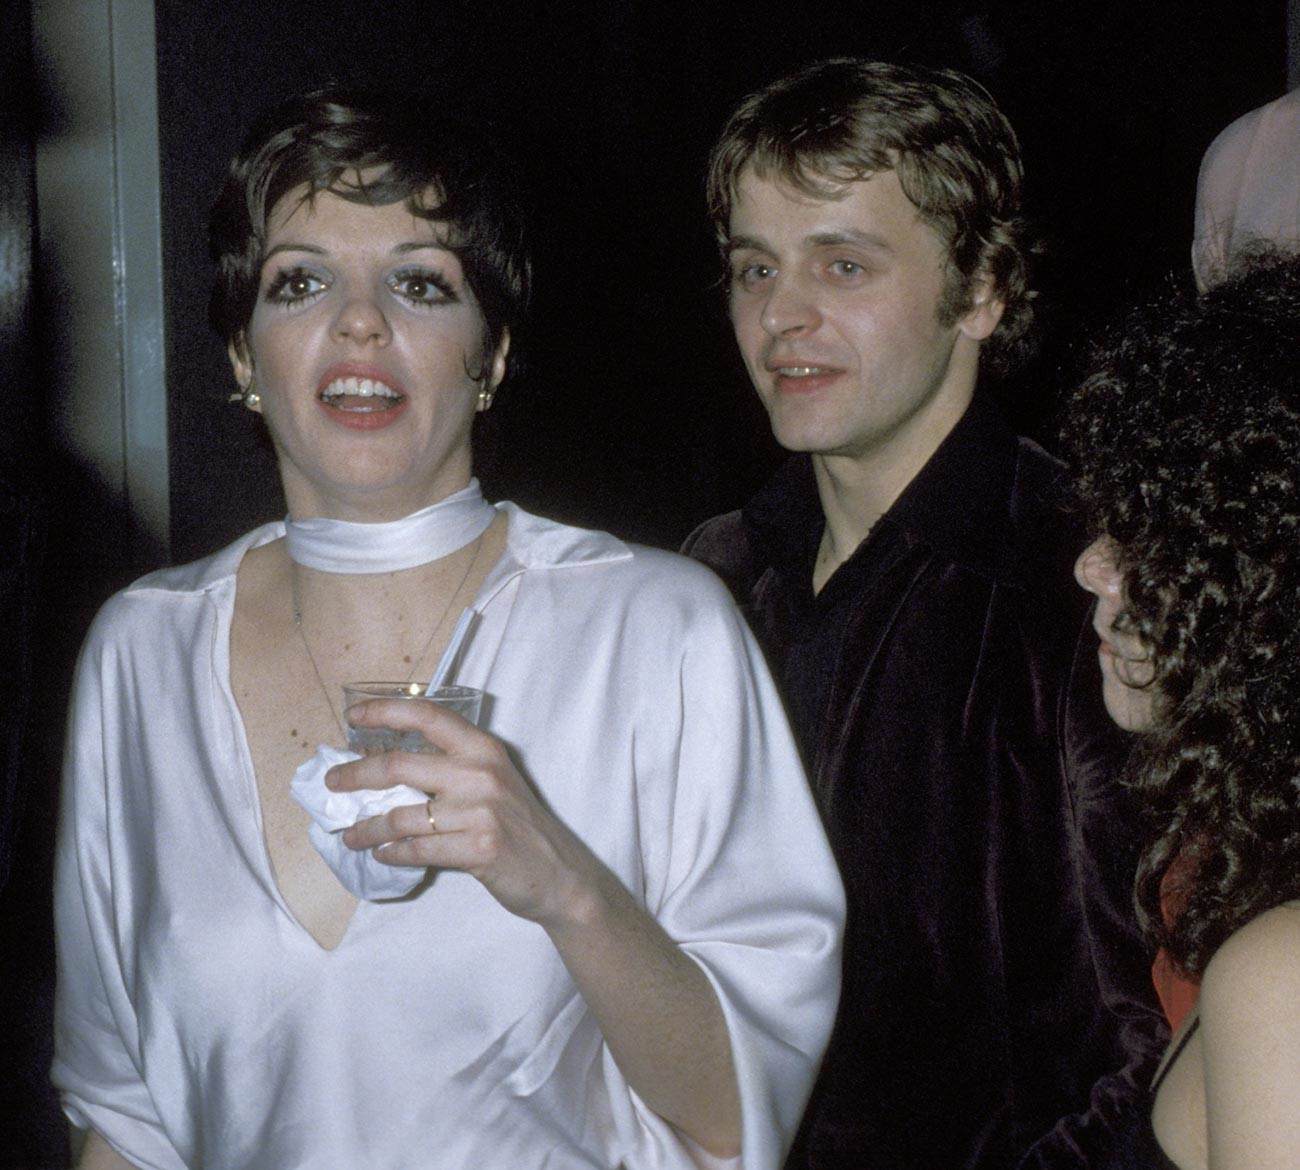 Liza Minnelli and Mikhail Baryshnikov in 1977.